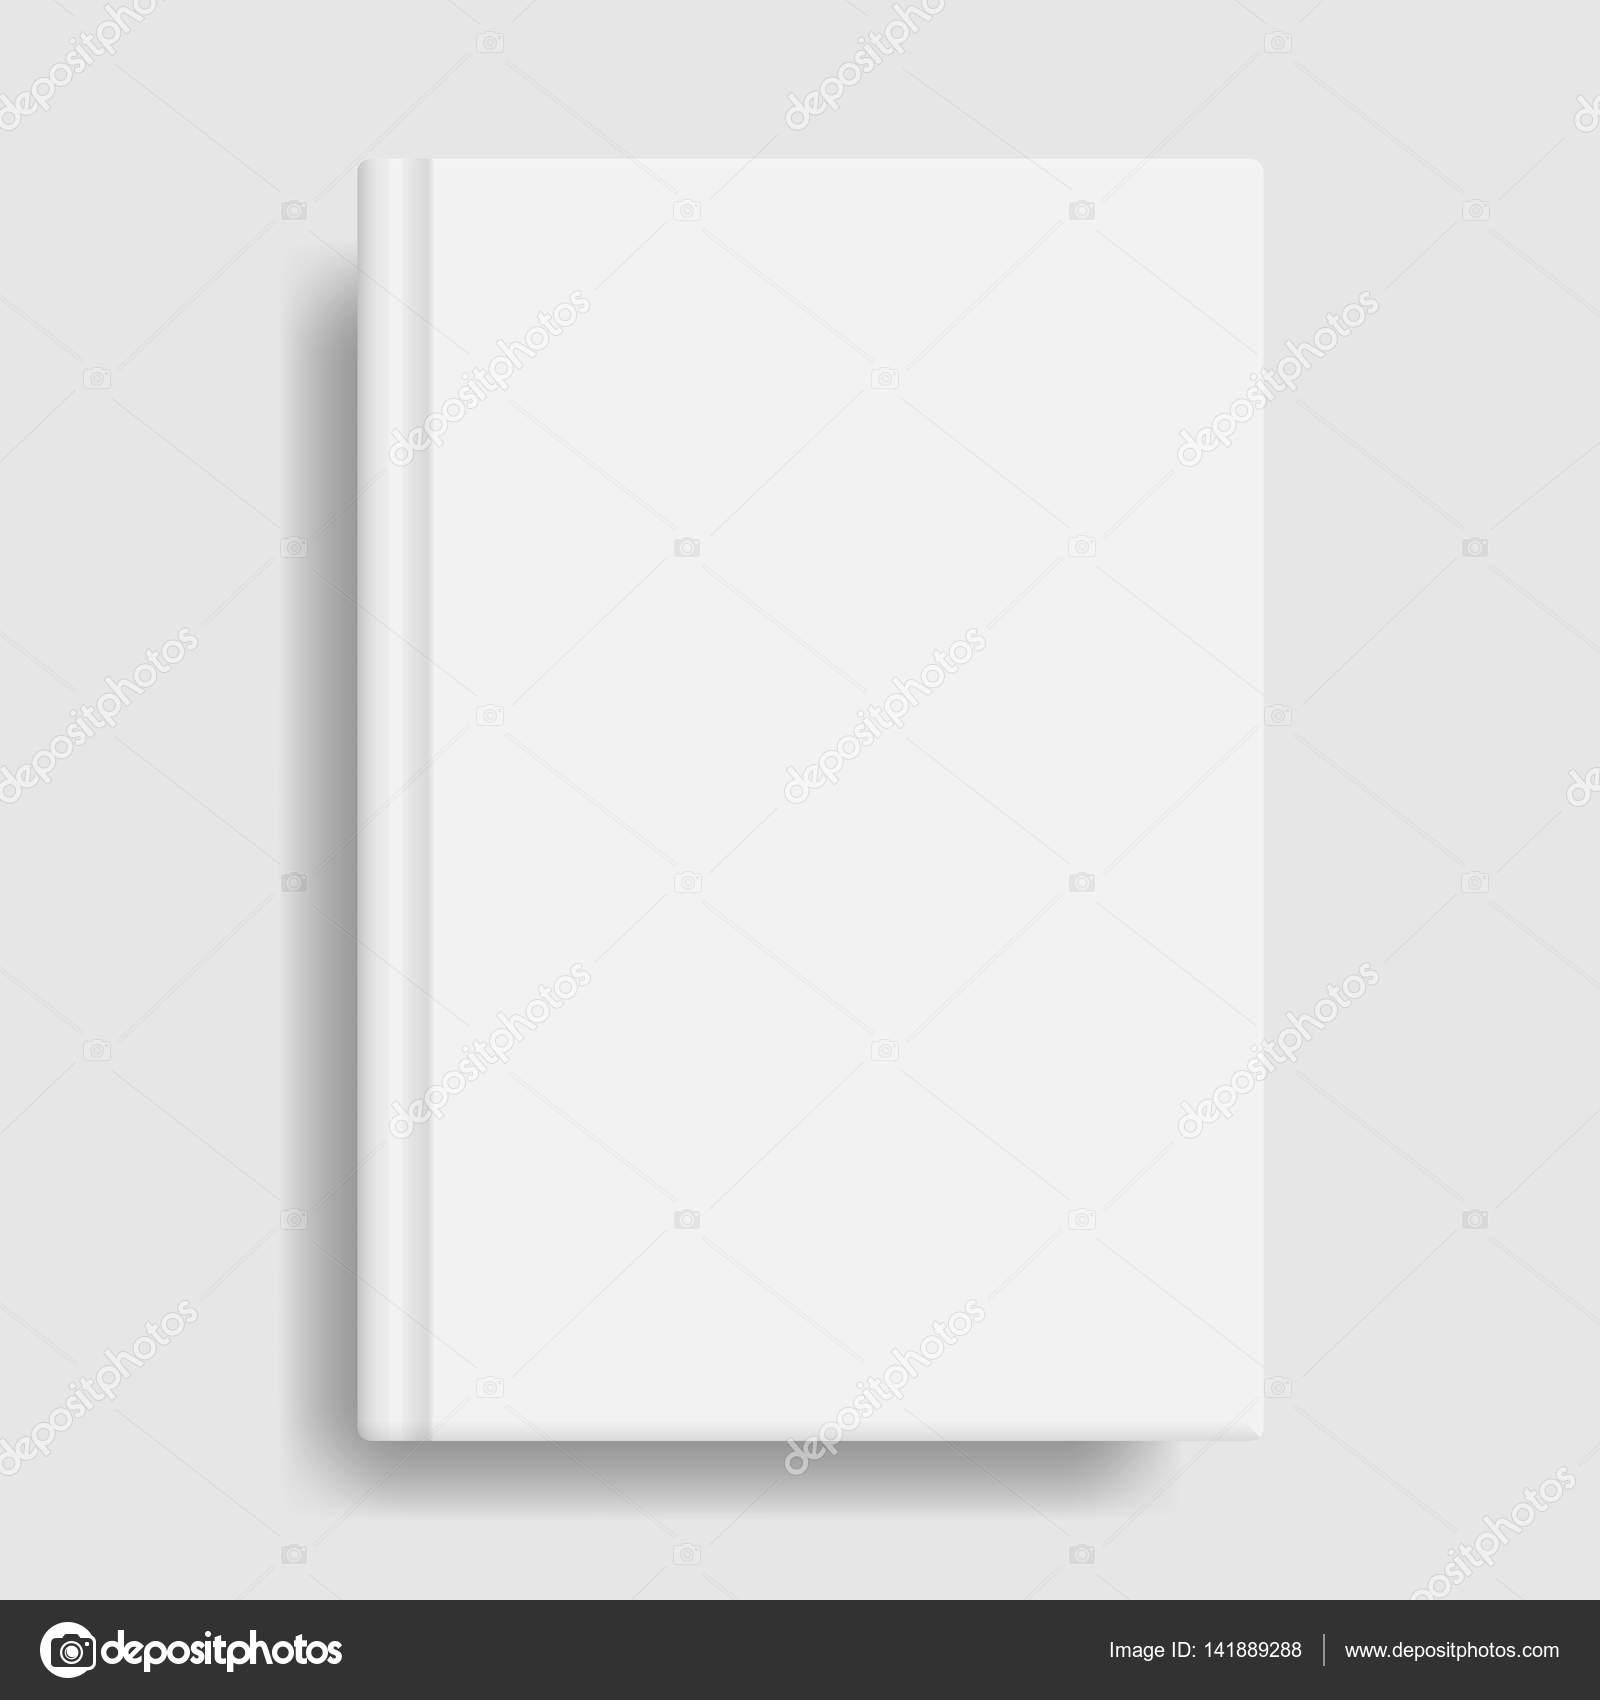 Book Cover White Zinfandel : 书封面样机。空白的白色模板 — 图库矢量图像 superiorstocker